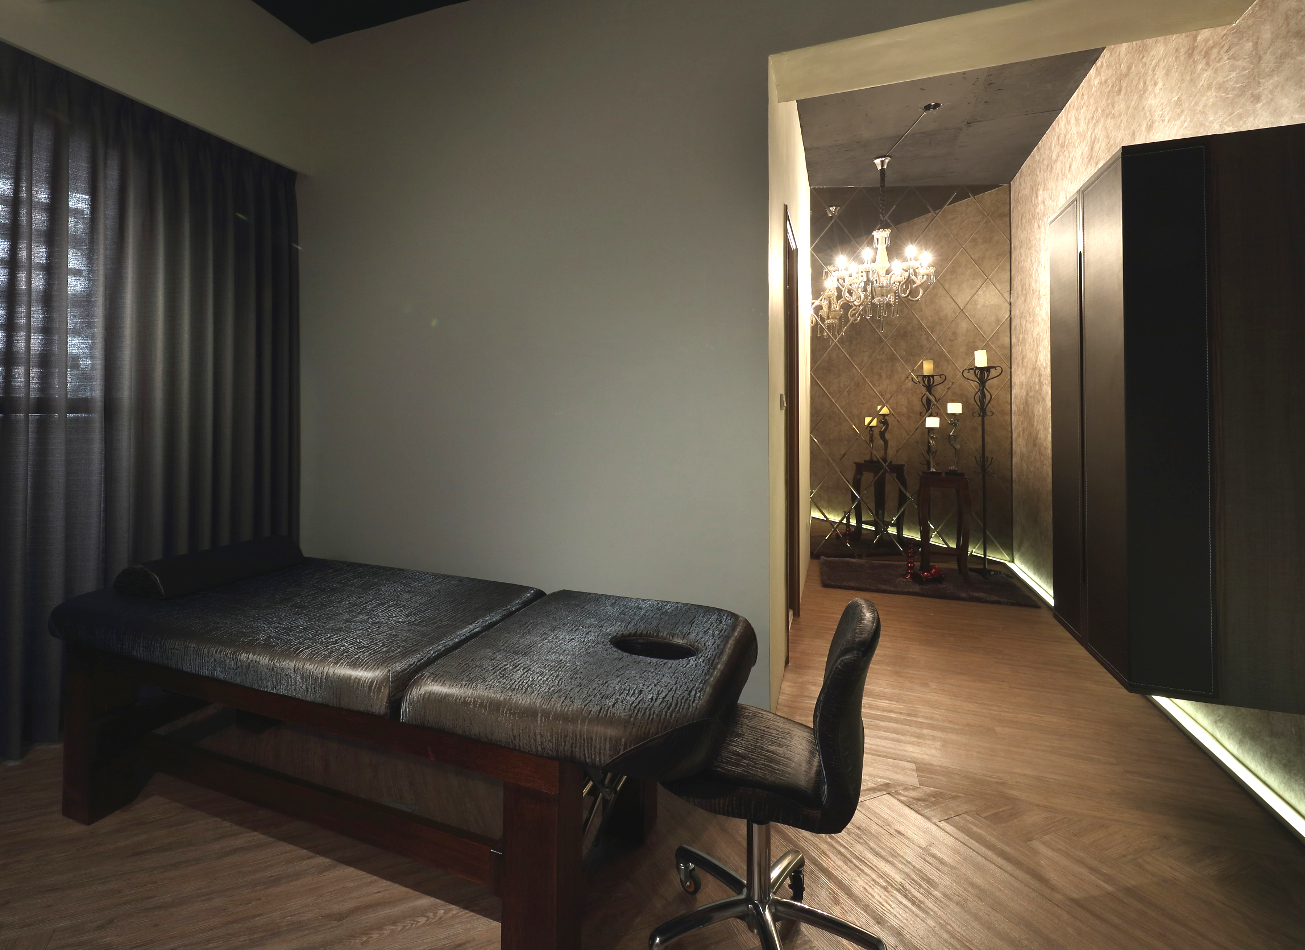 spa relaxation detente soins relax thalasso activites paris